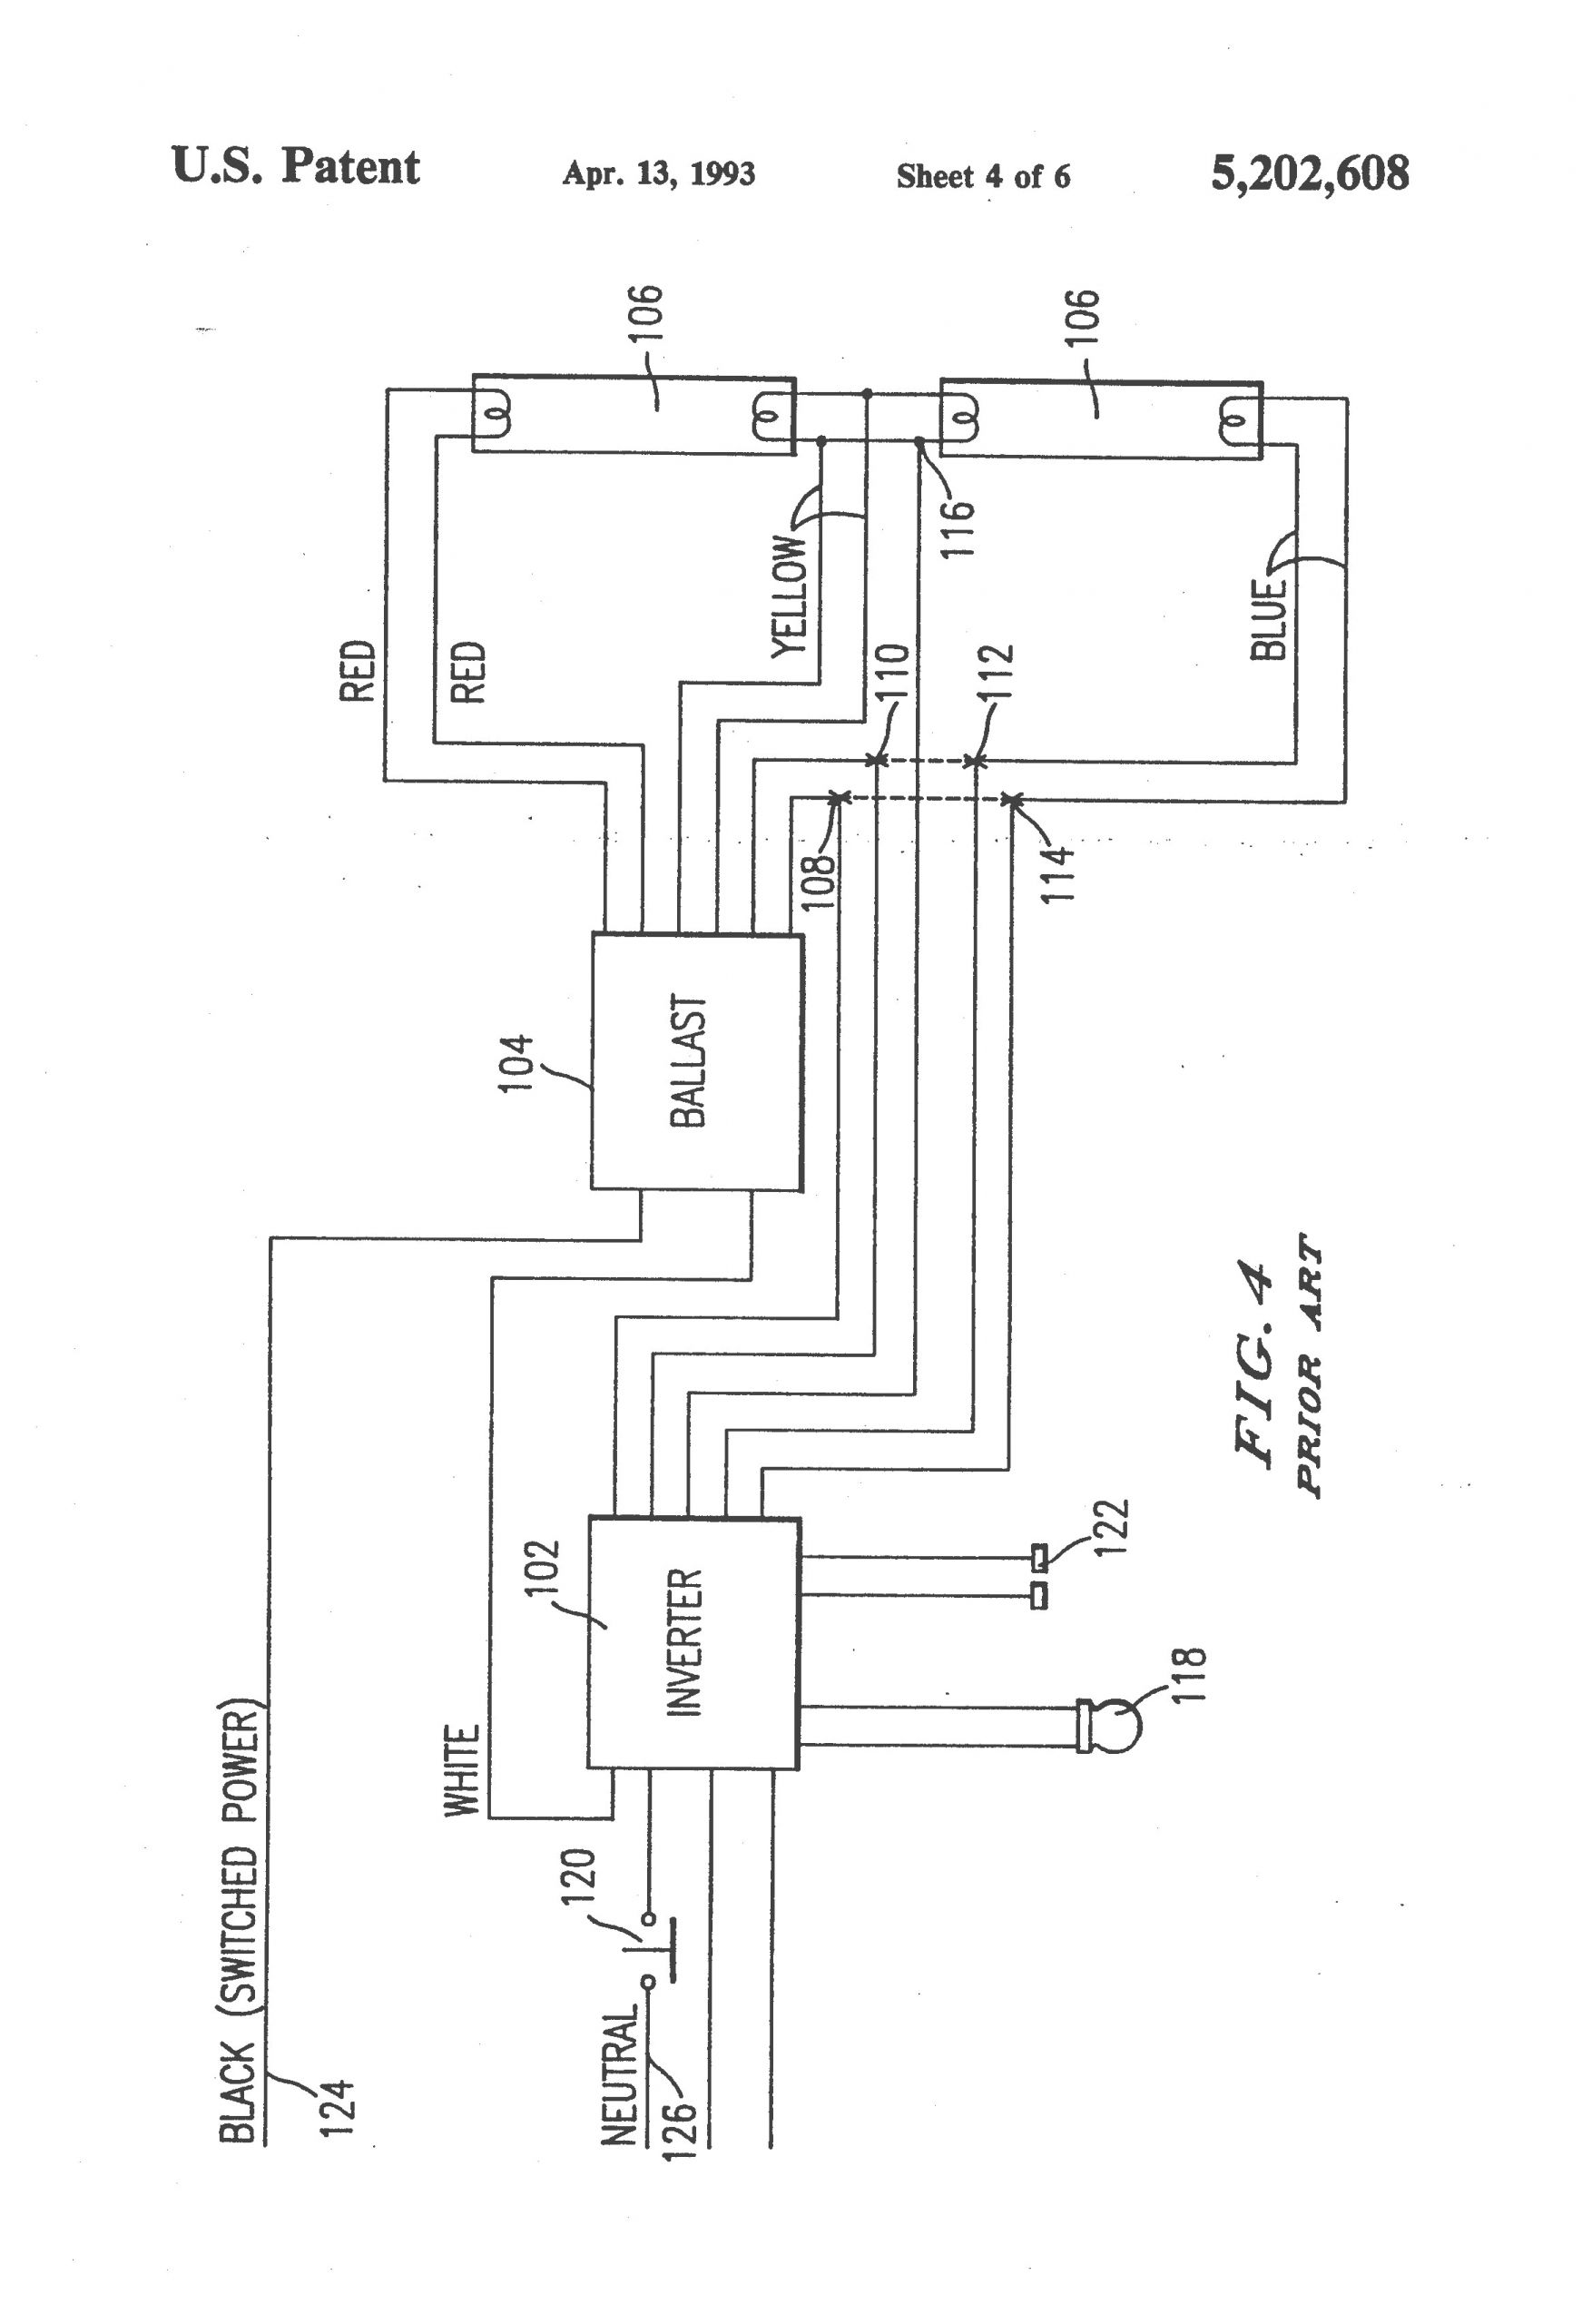 high pressure sodium ballast wiring diagram emergency ballast wiring diagram mh information wiring diagram e280a2 of high pressure sodium ballast wiring diagram jpg